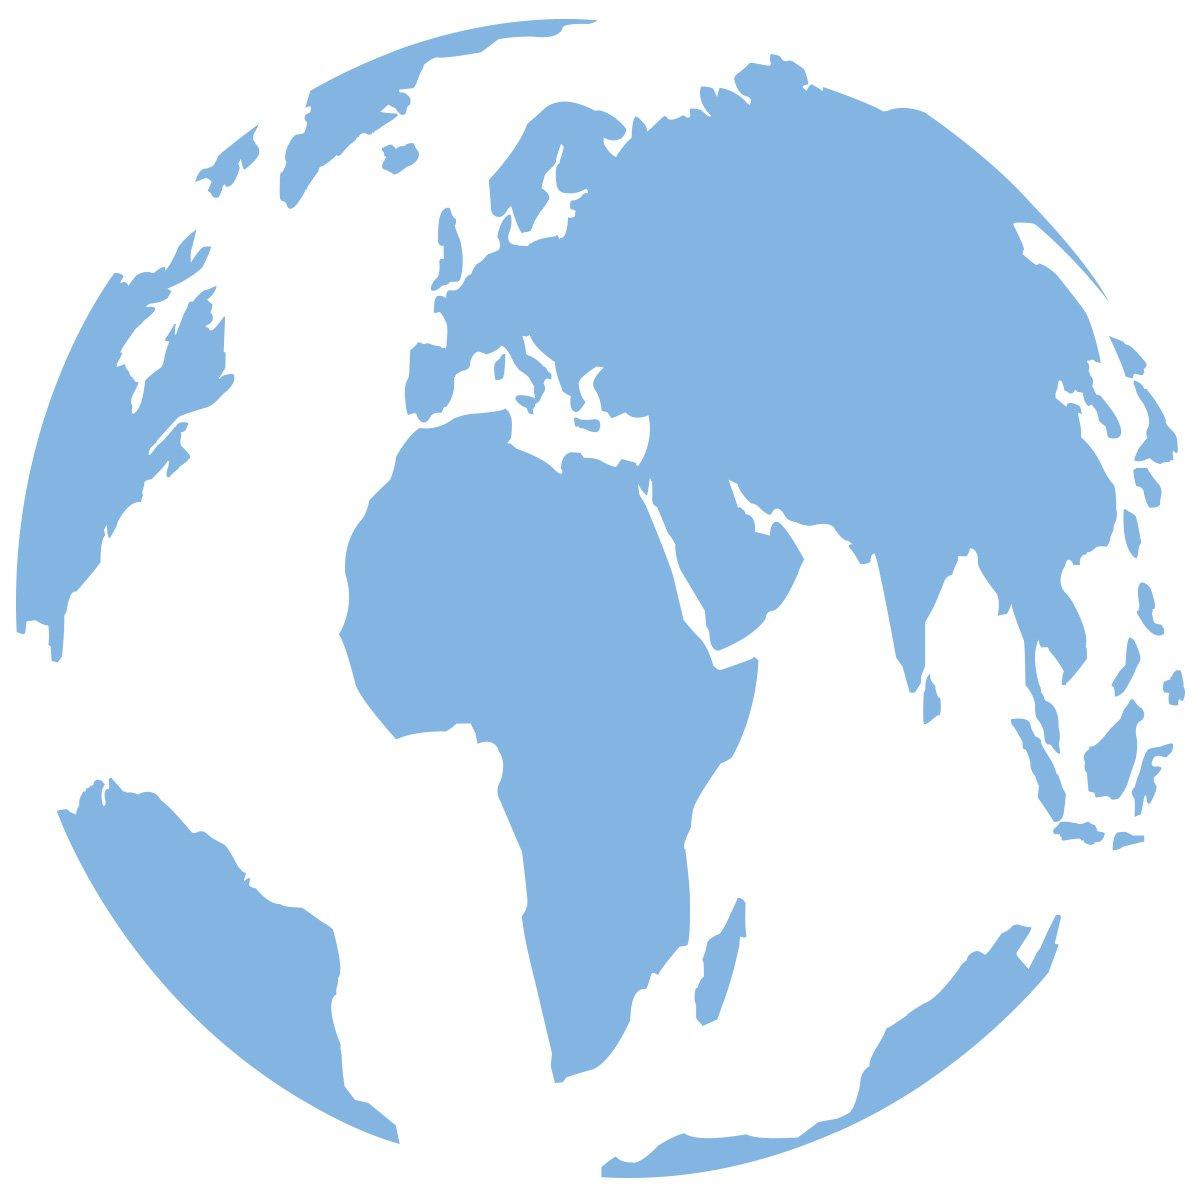 WANDKINGS Wandtattoo - Globus - - - 90 x 90 cm - Kupfer - Wähle aus 5 Größen & 35 Farben B078YF4ZJW Wandtattoos & Wandbilder 3410a0